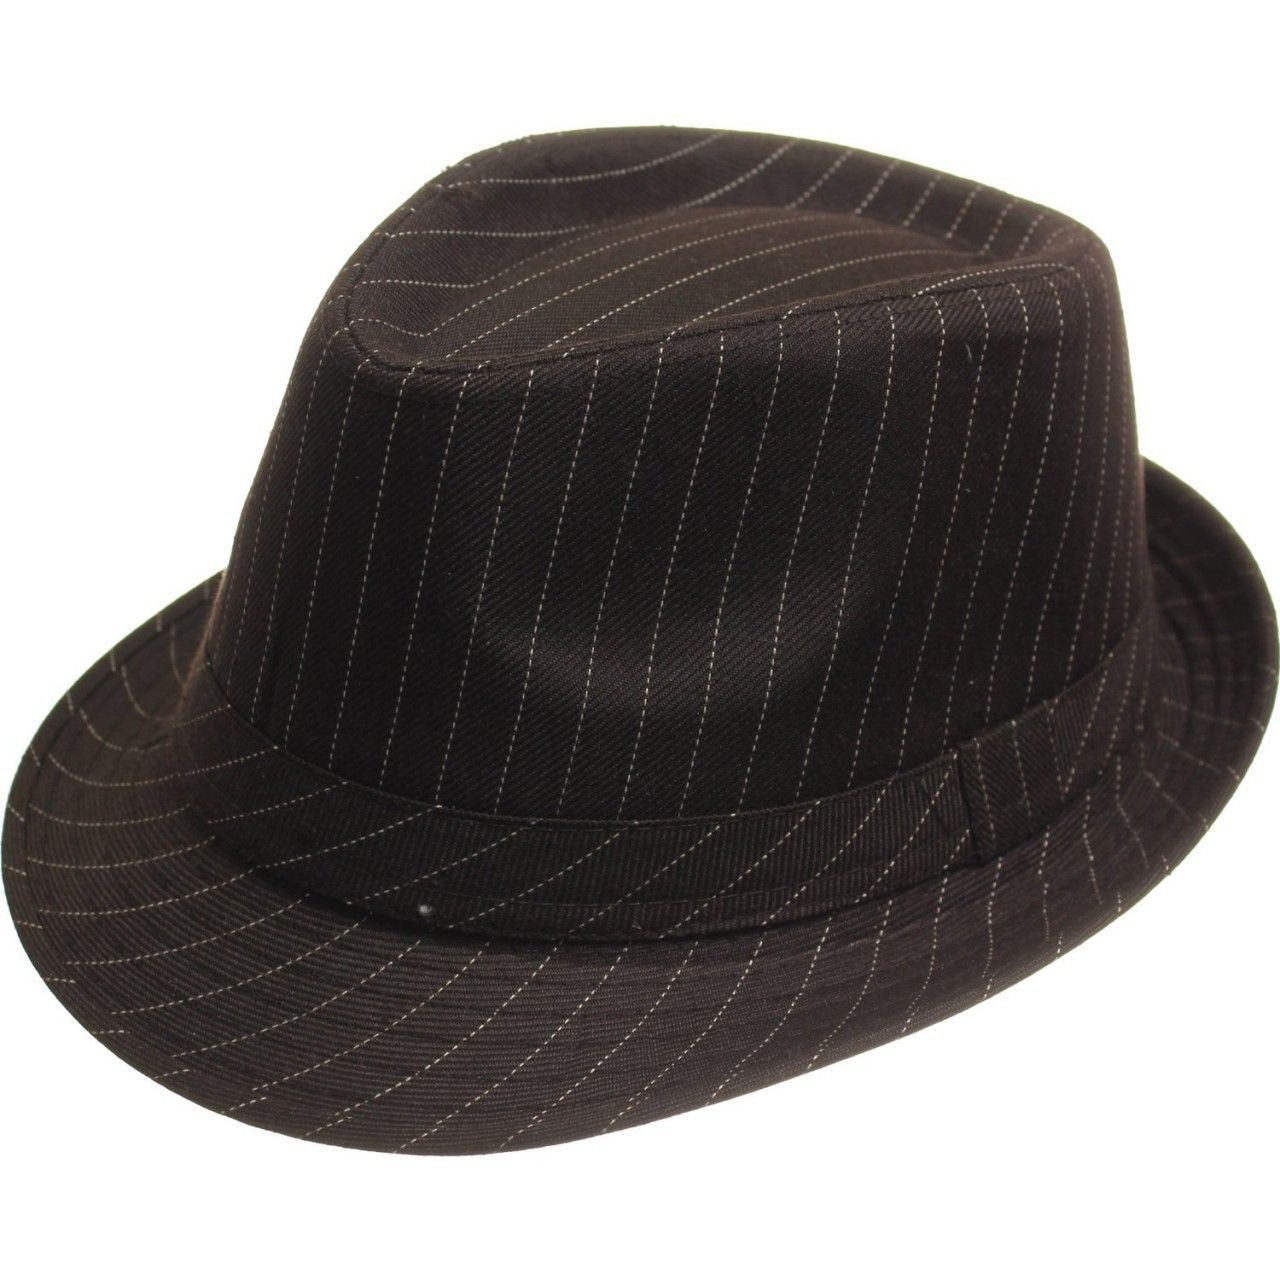 7eabdf815 Gangster Pinstripe Fedora Hat Brown 12 PACK 1319   1920's Theme ...